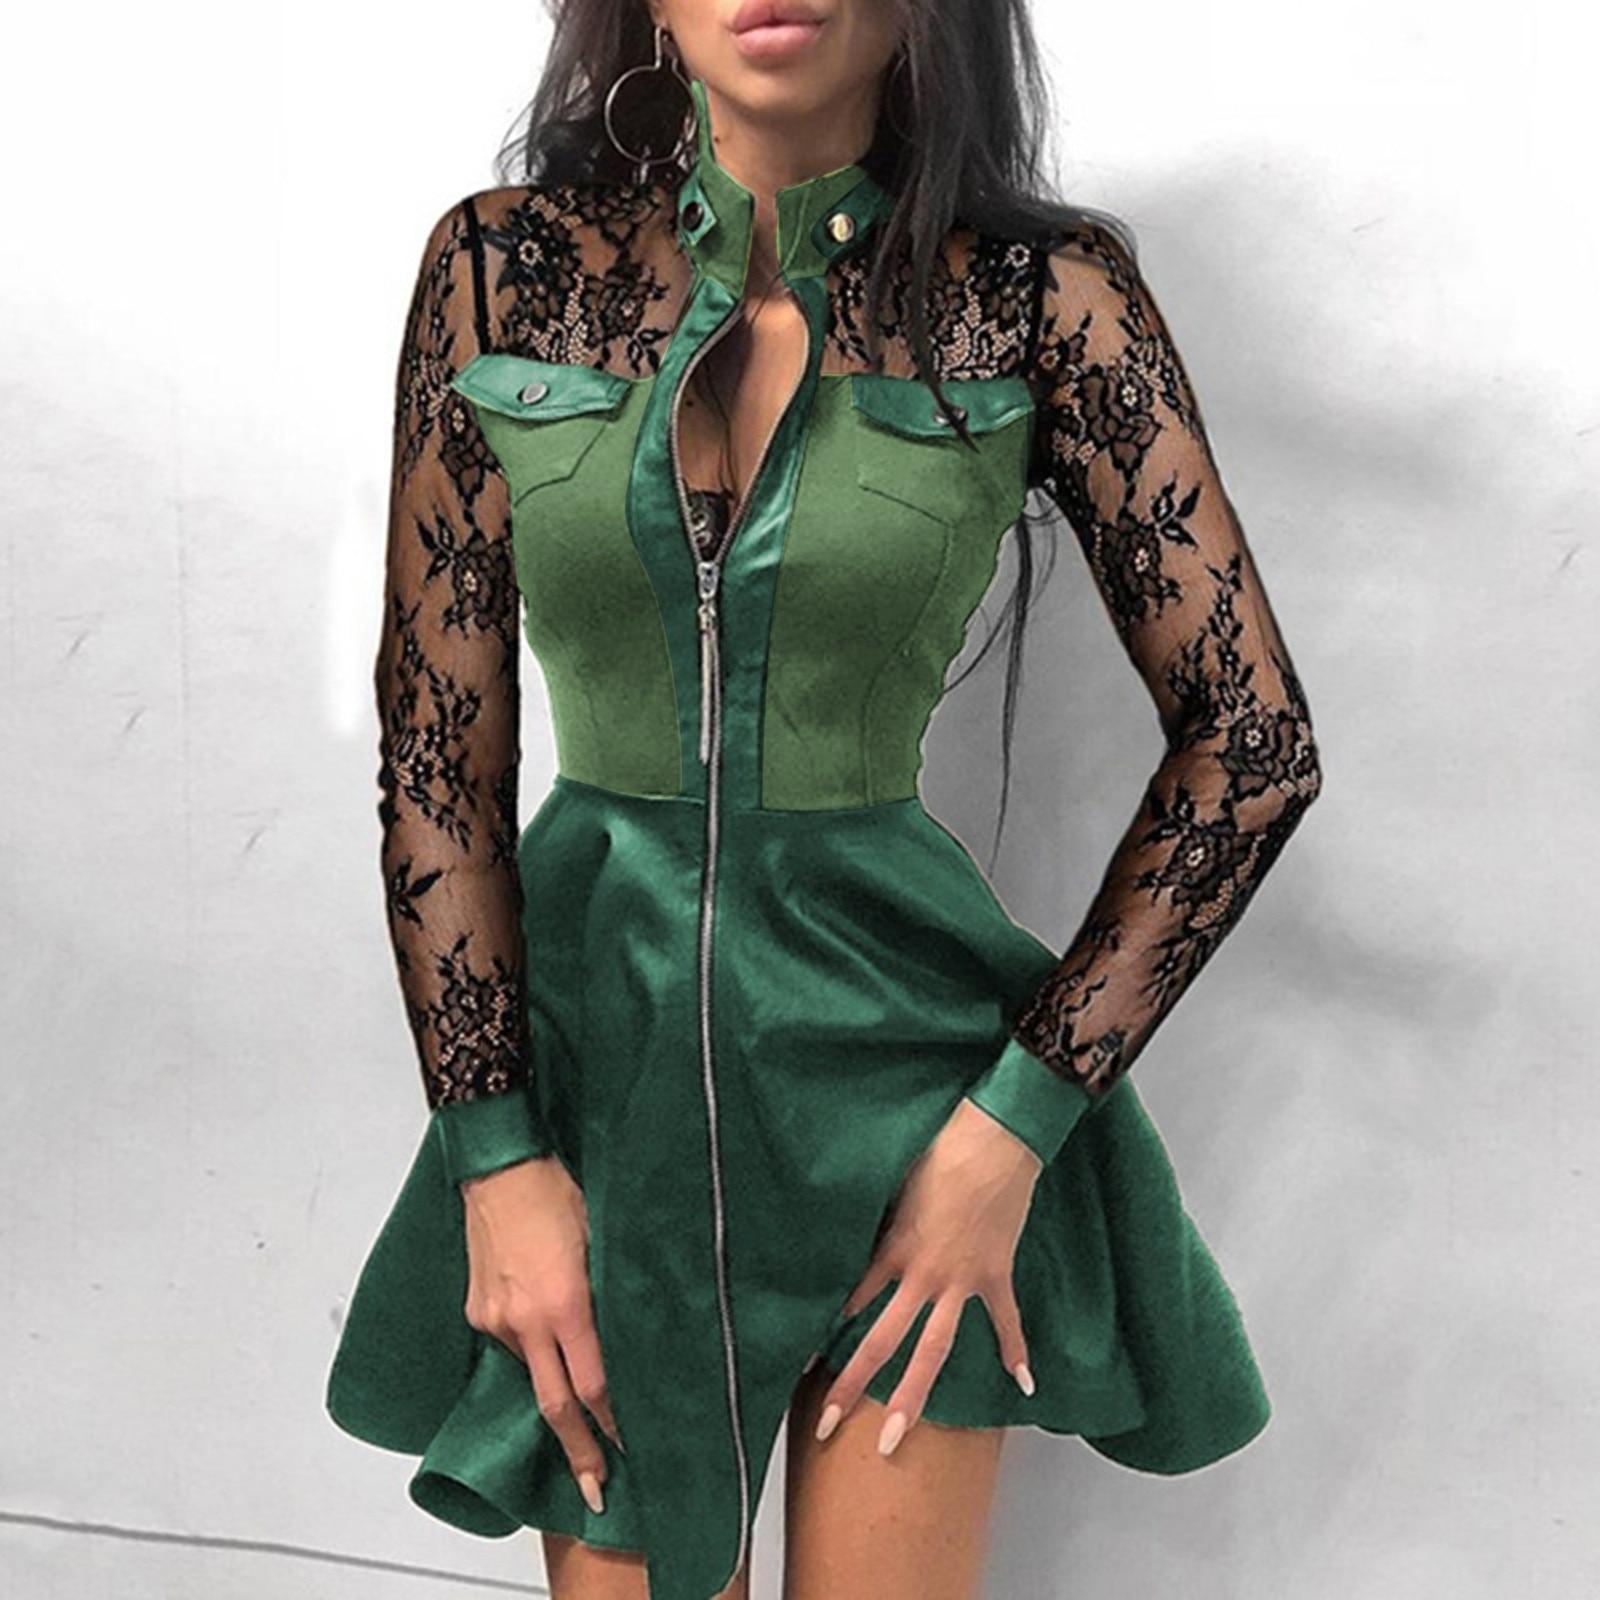 vestido de mujer Women Mesh Lace Patchwork Zipper Design Leather Dress Ladies Dress femme robe